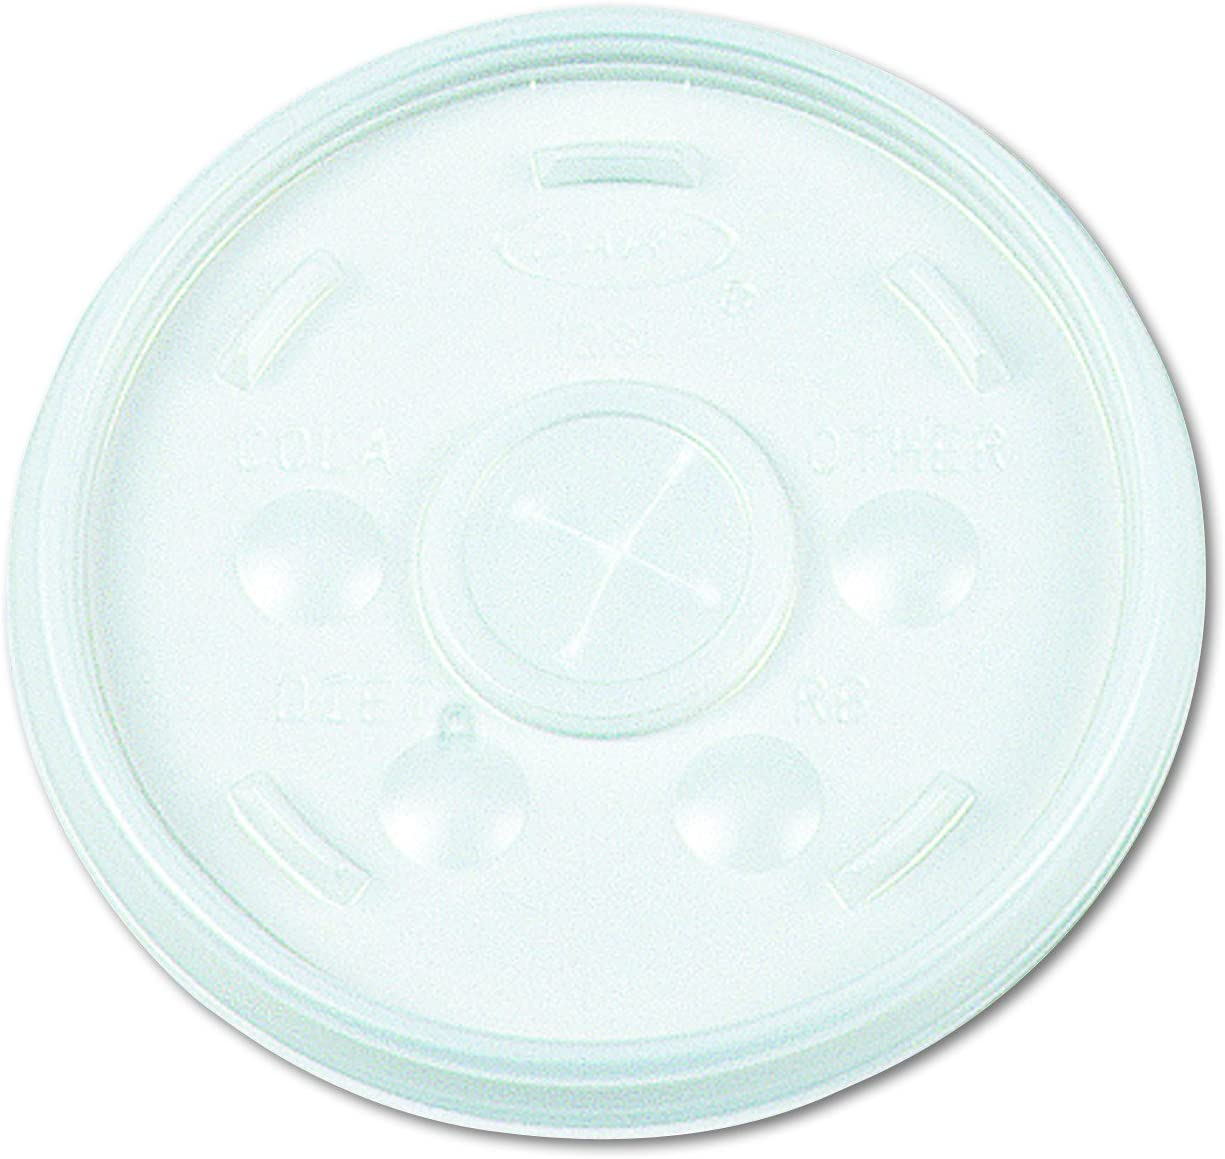 Dart 32SL Plastic Lids, Straw Slot, Fits 32oz Hot/Cold Foam Cups, White (Case of 500)